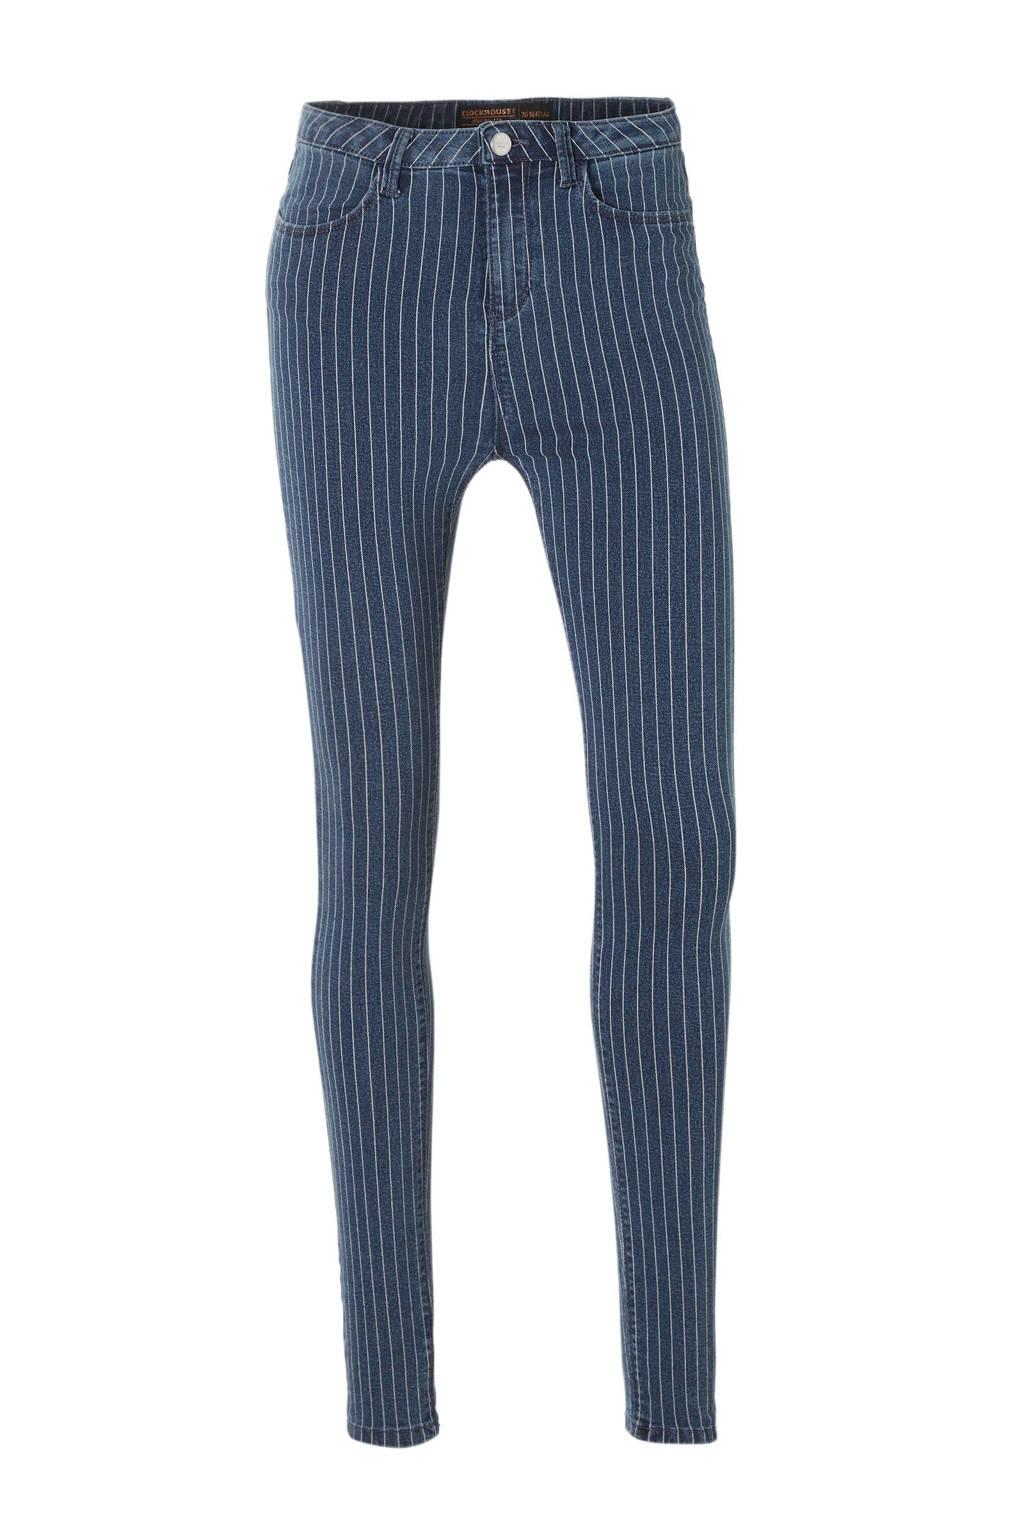 C&A Clockhouse gestreepte high waist skinny jeans, Donkerblauw